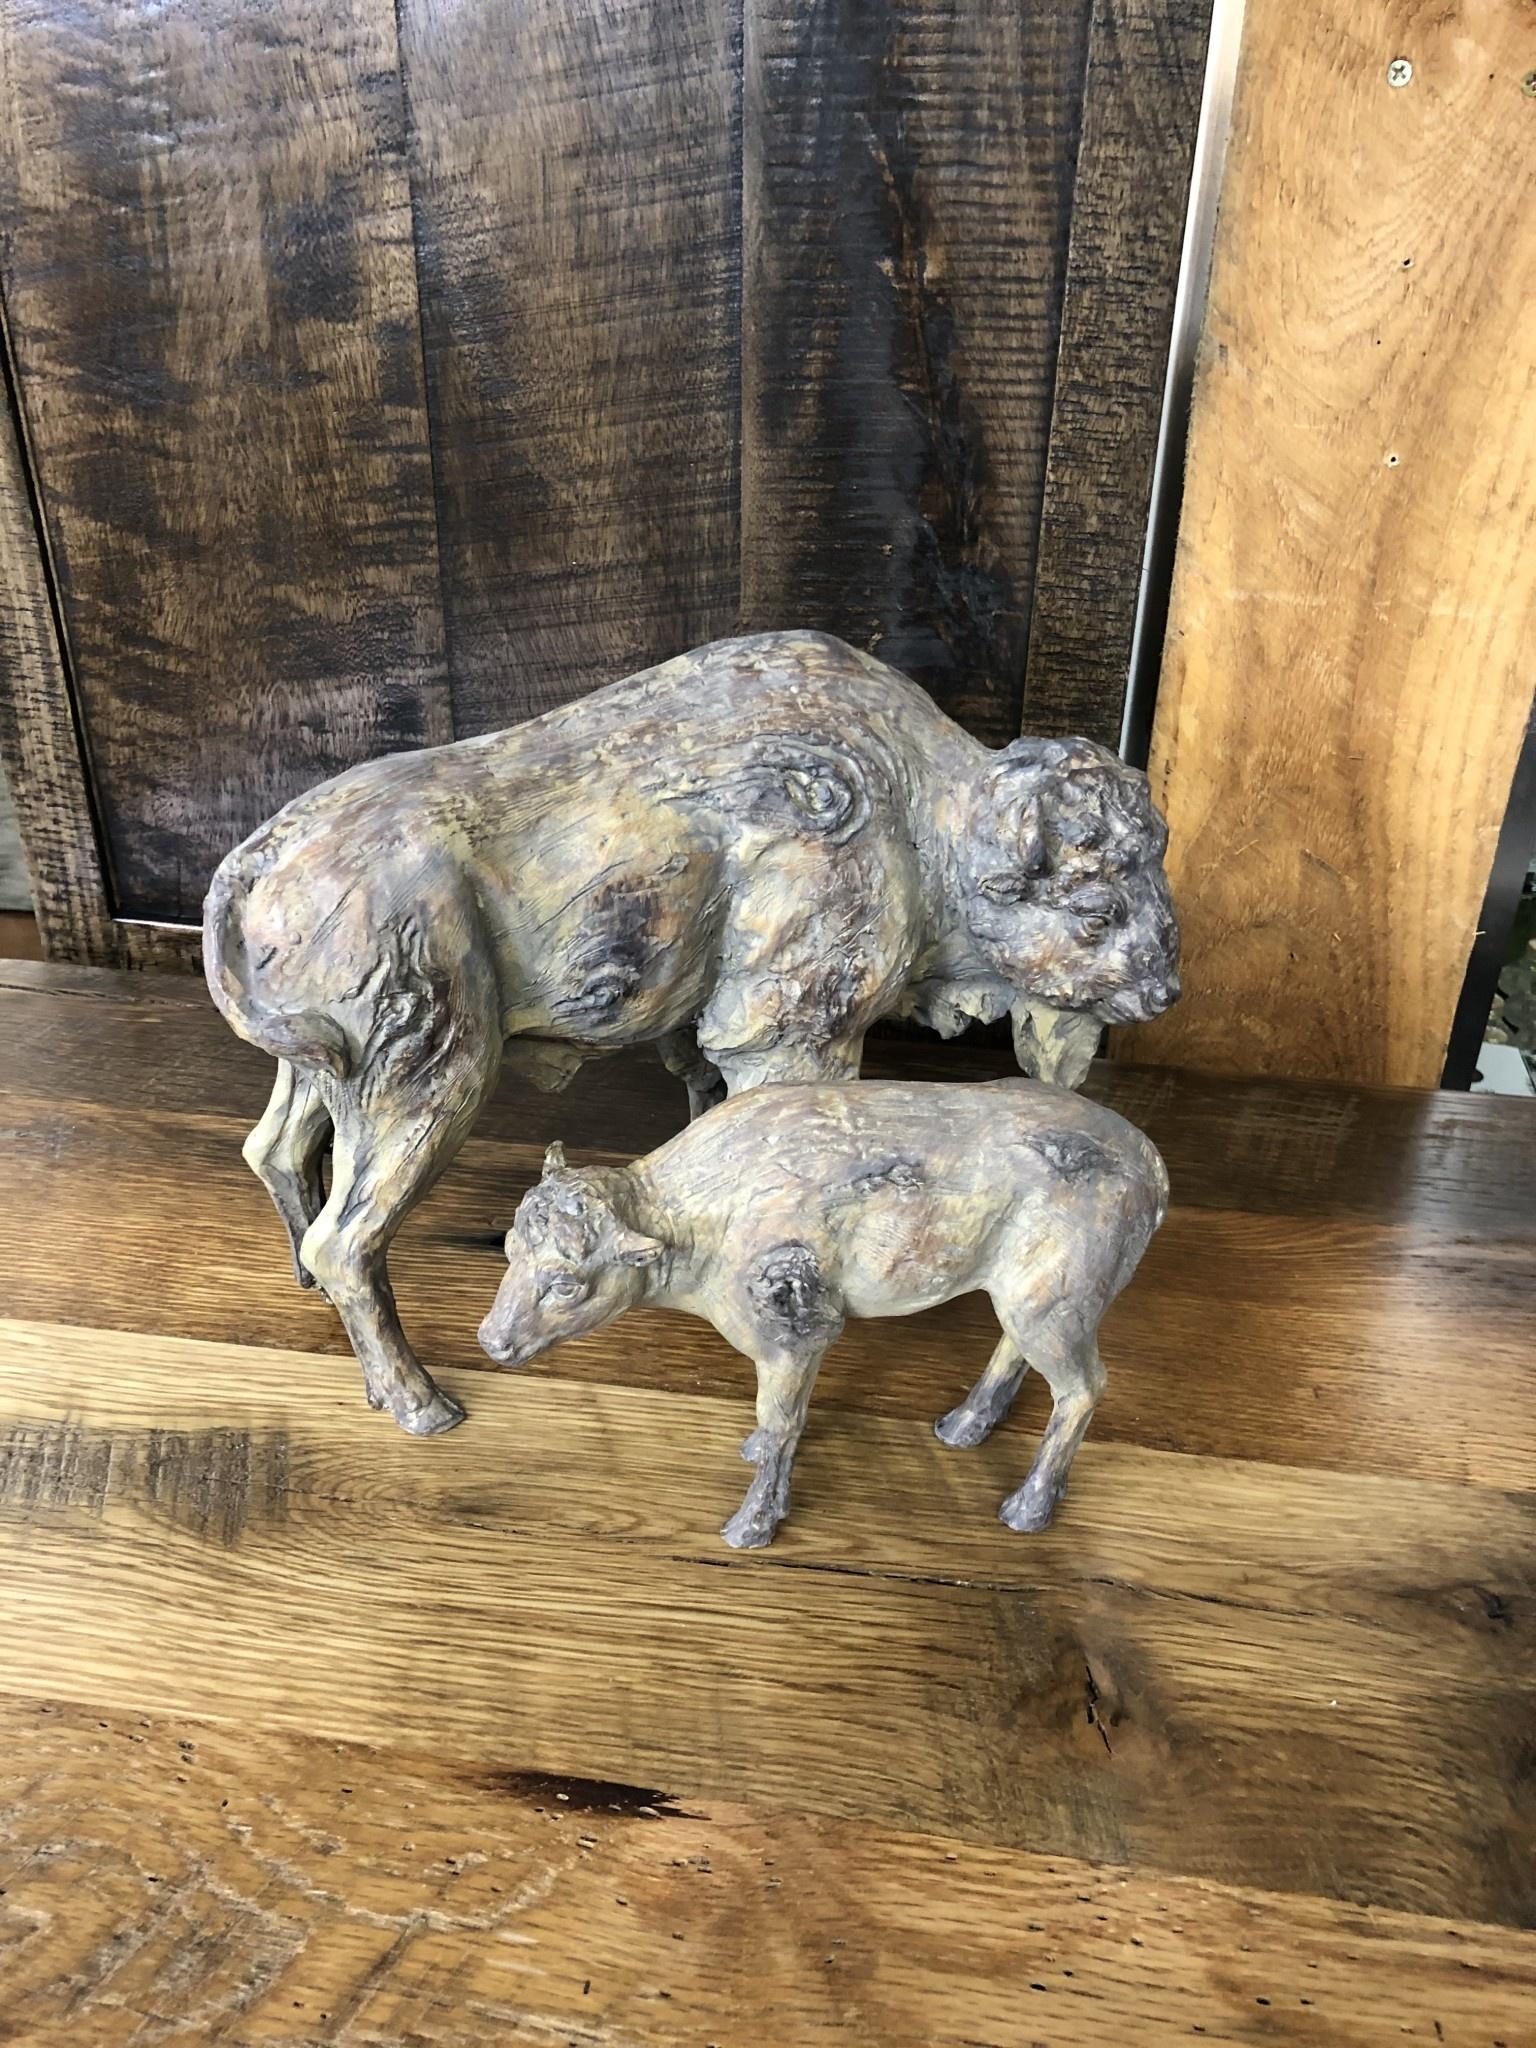 Simpkins-Canterbury Lane Faux Carved Wood Buffalo Cow & Calf - 2 pieces